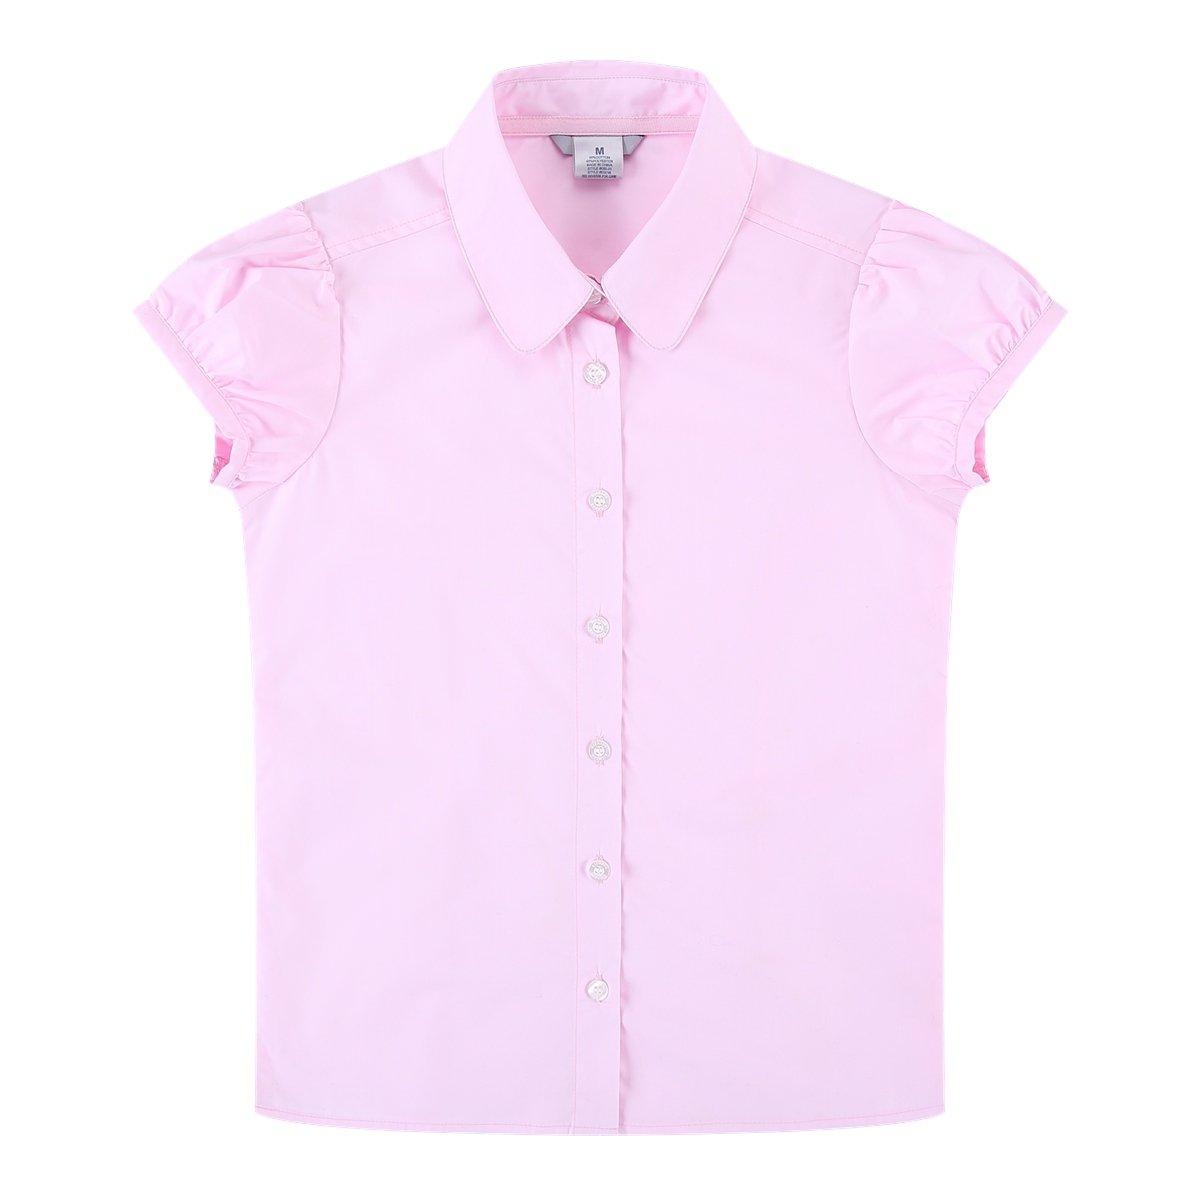 Bienzoe Big Girl's School Uniforms Oxford Short Puff Sleeve Blouse Pink L